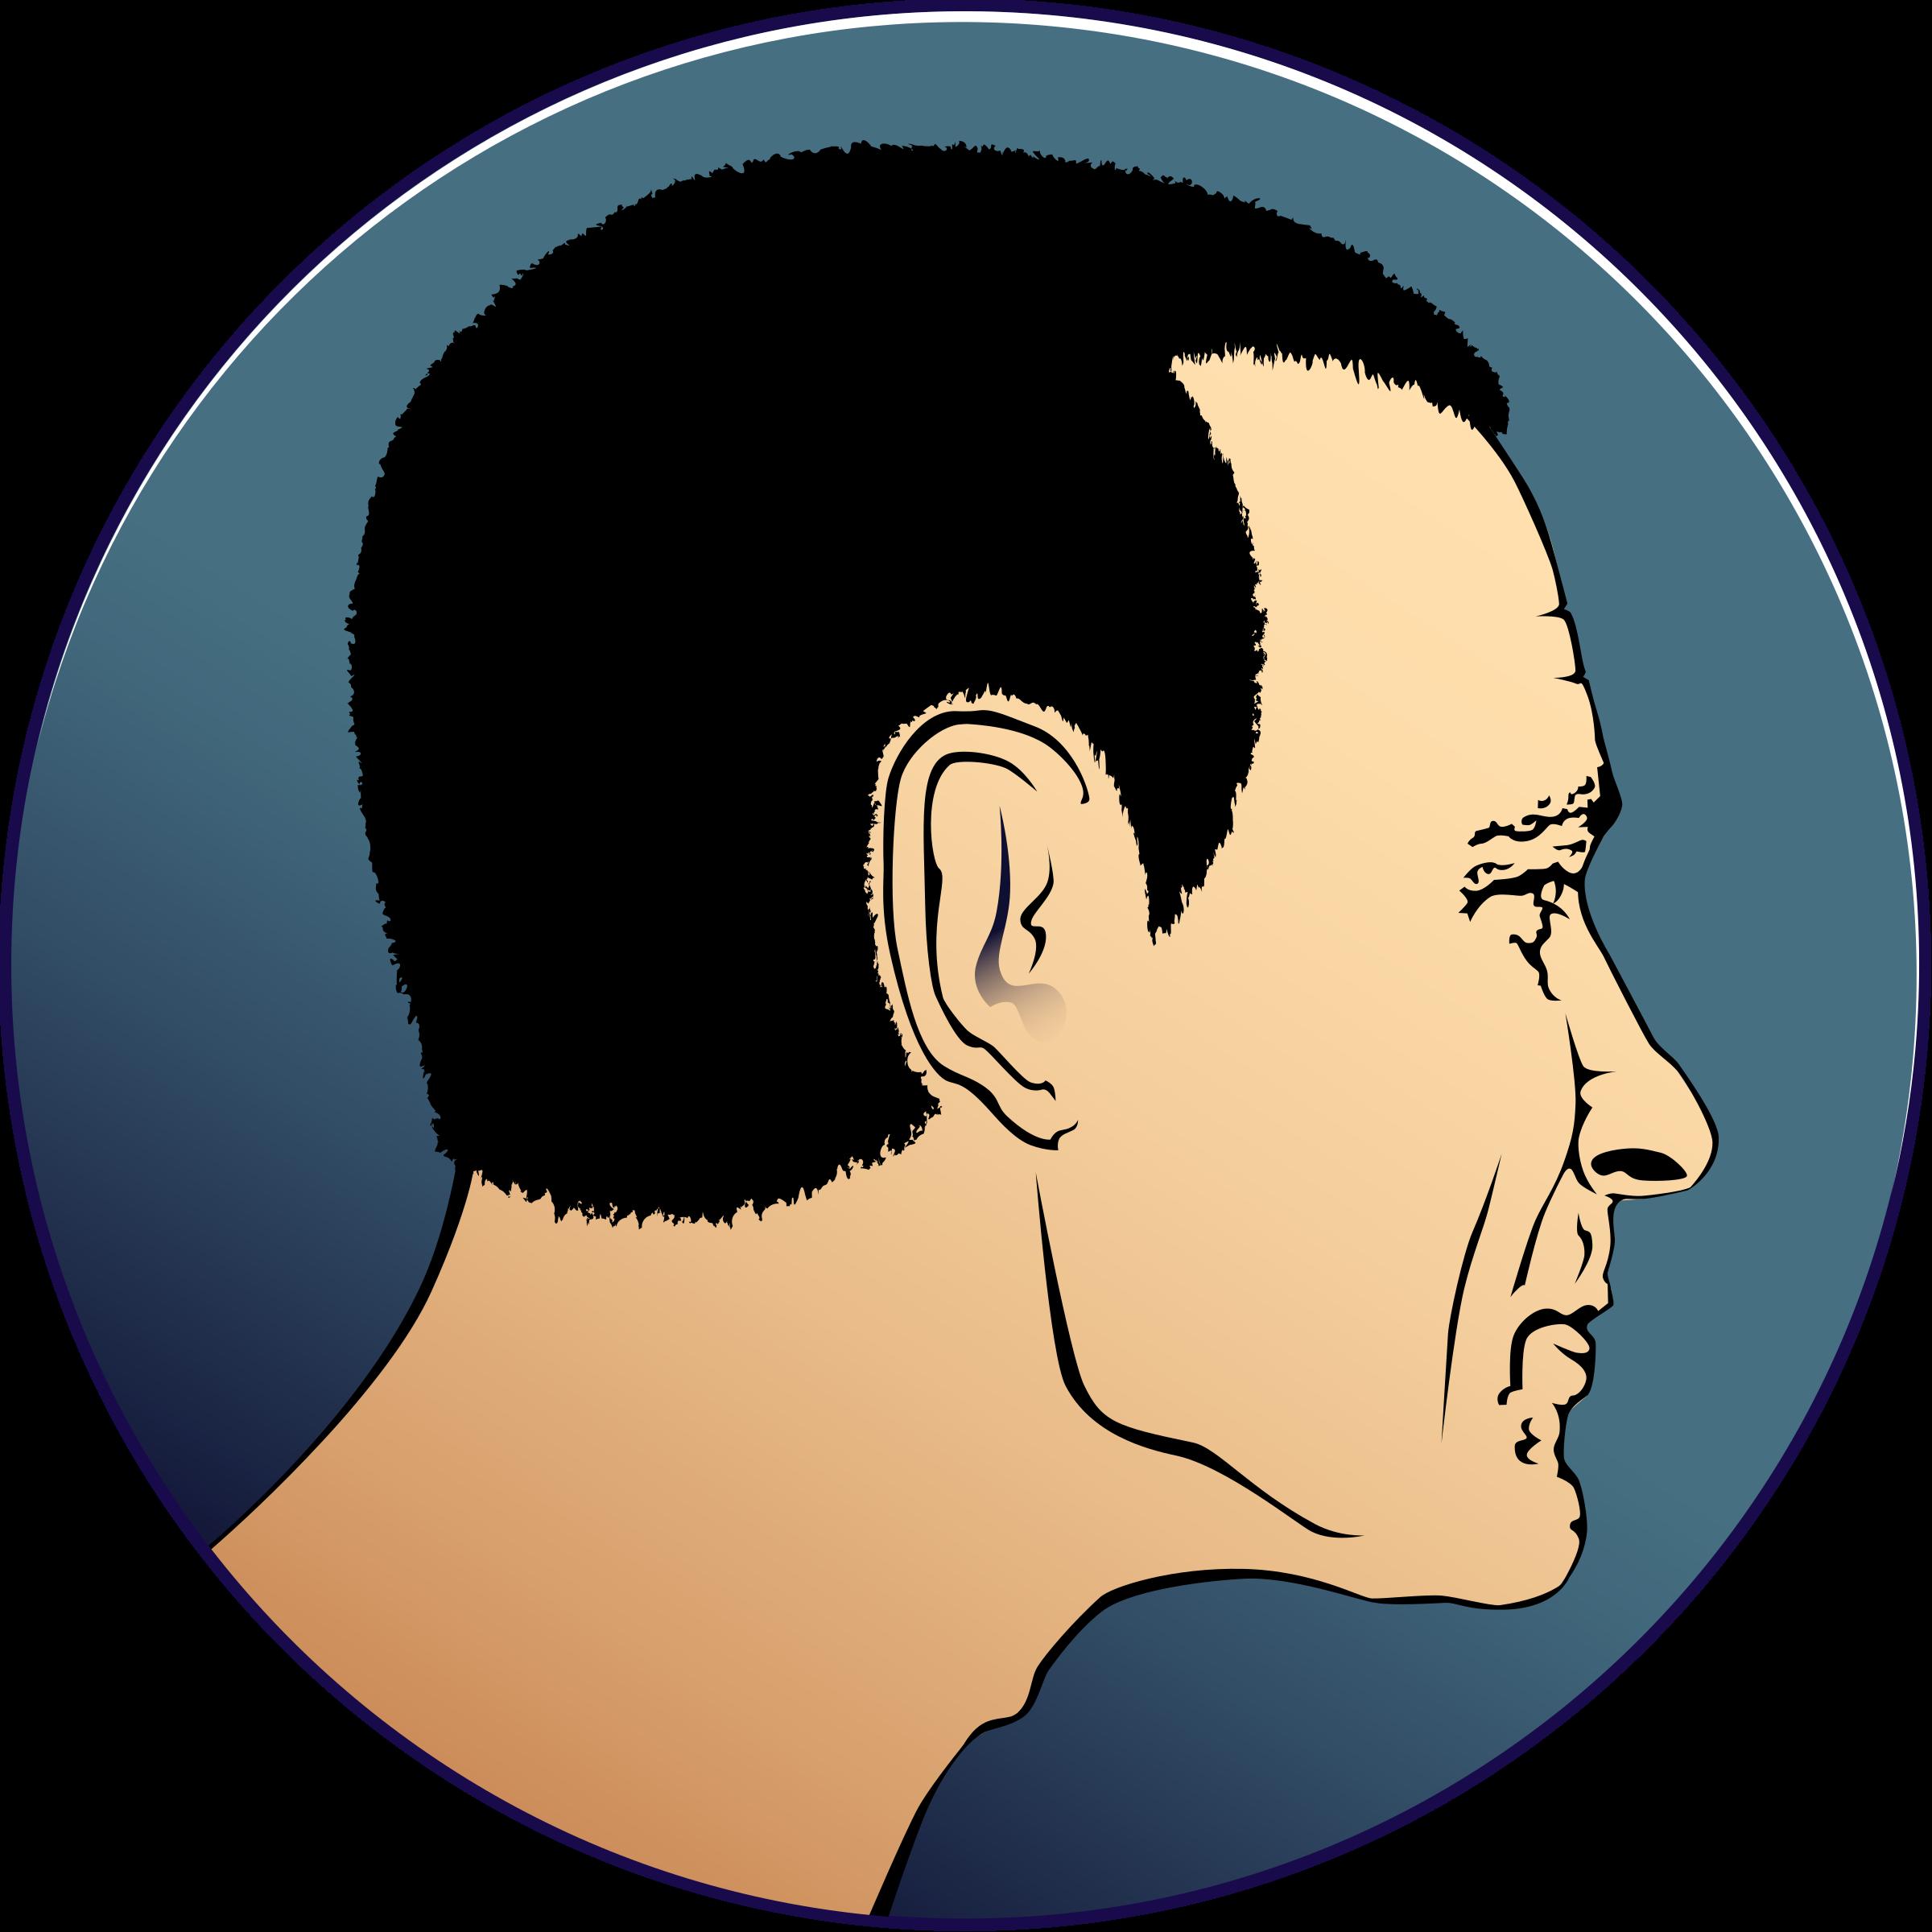 Man s profile big. Clipart ear part head